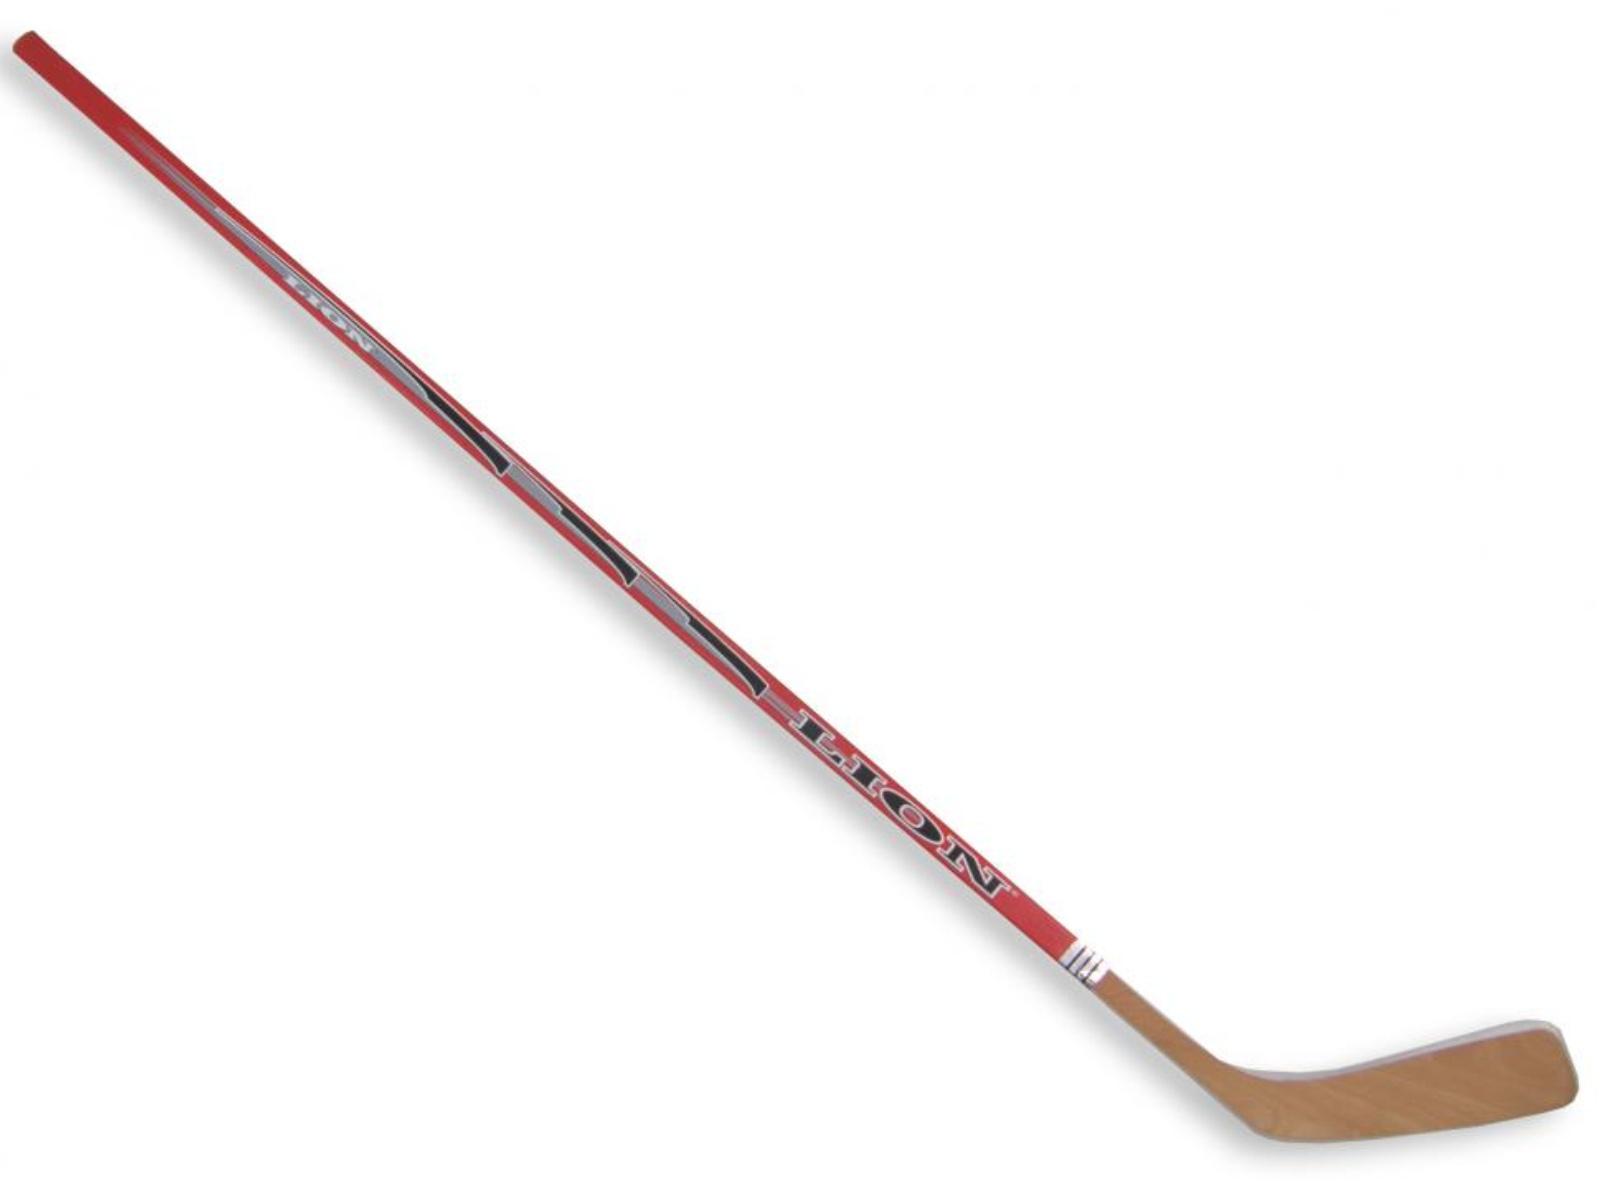 Hokejka LION 3377 - 147 cm